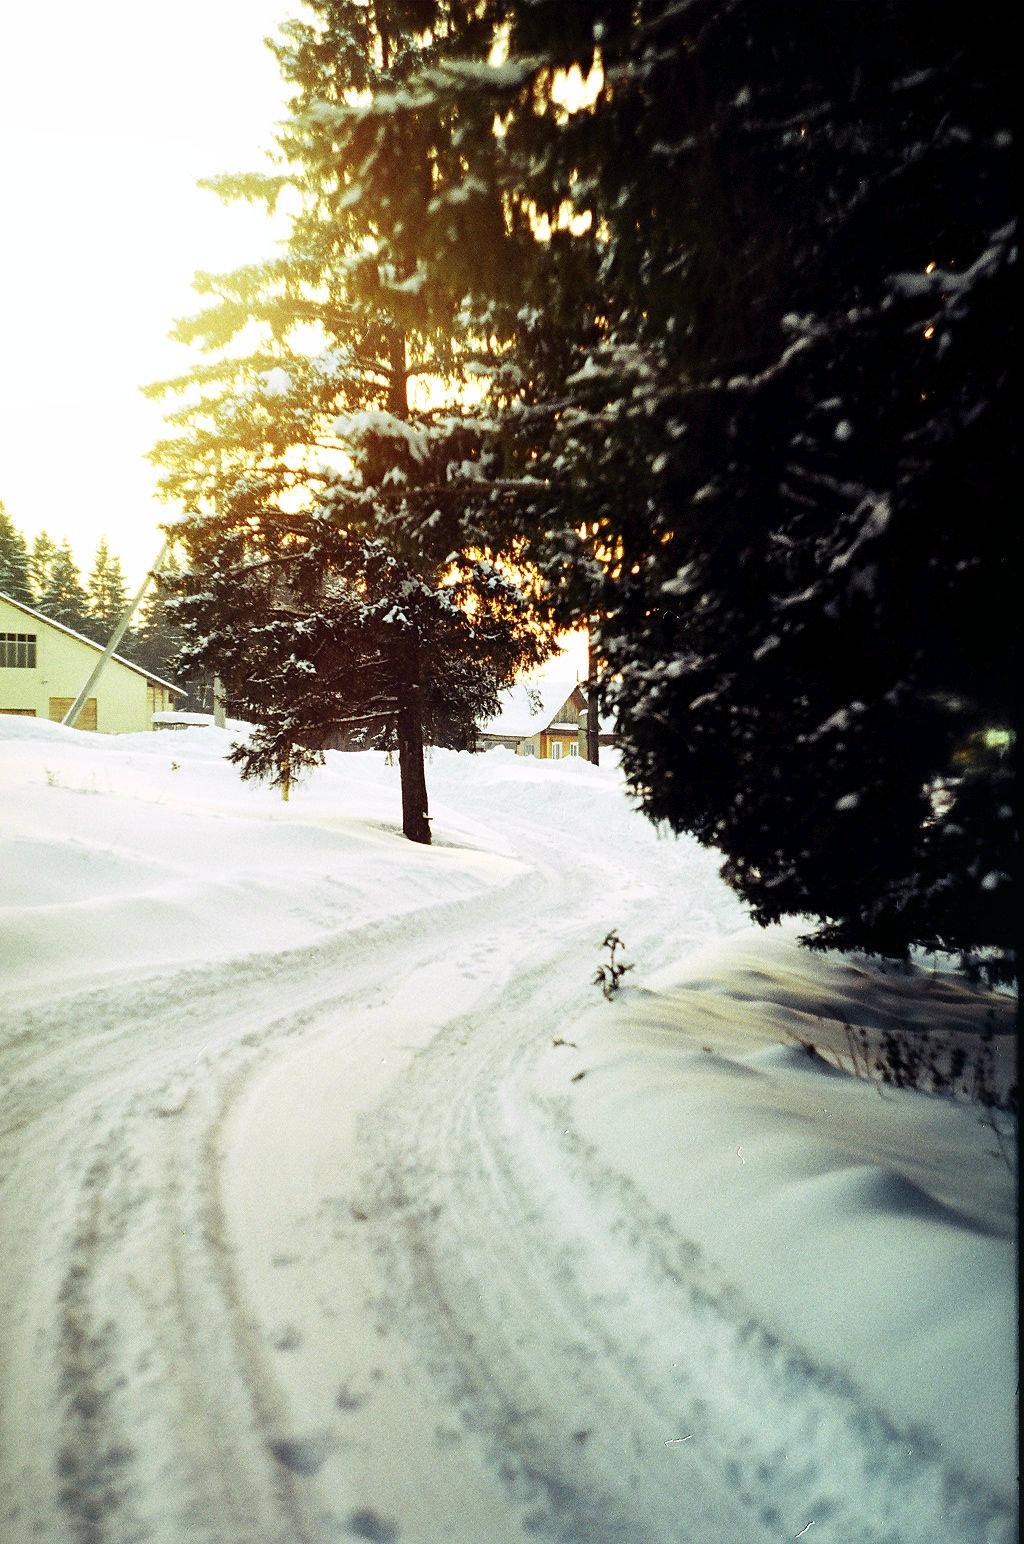 Зимняя дорога. Блиц: зима